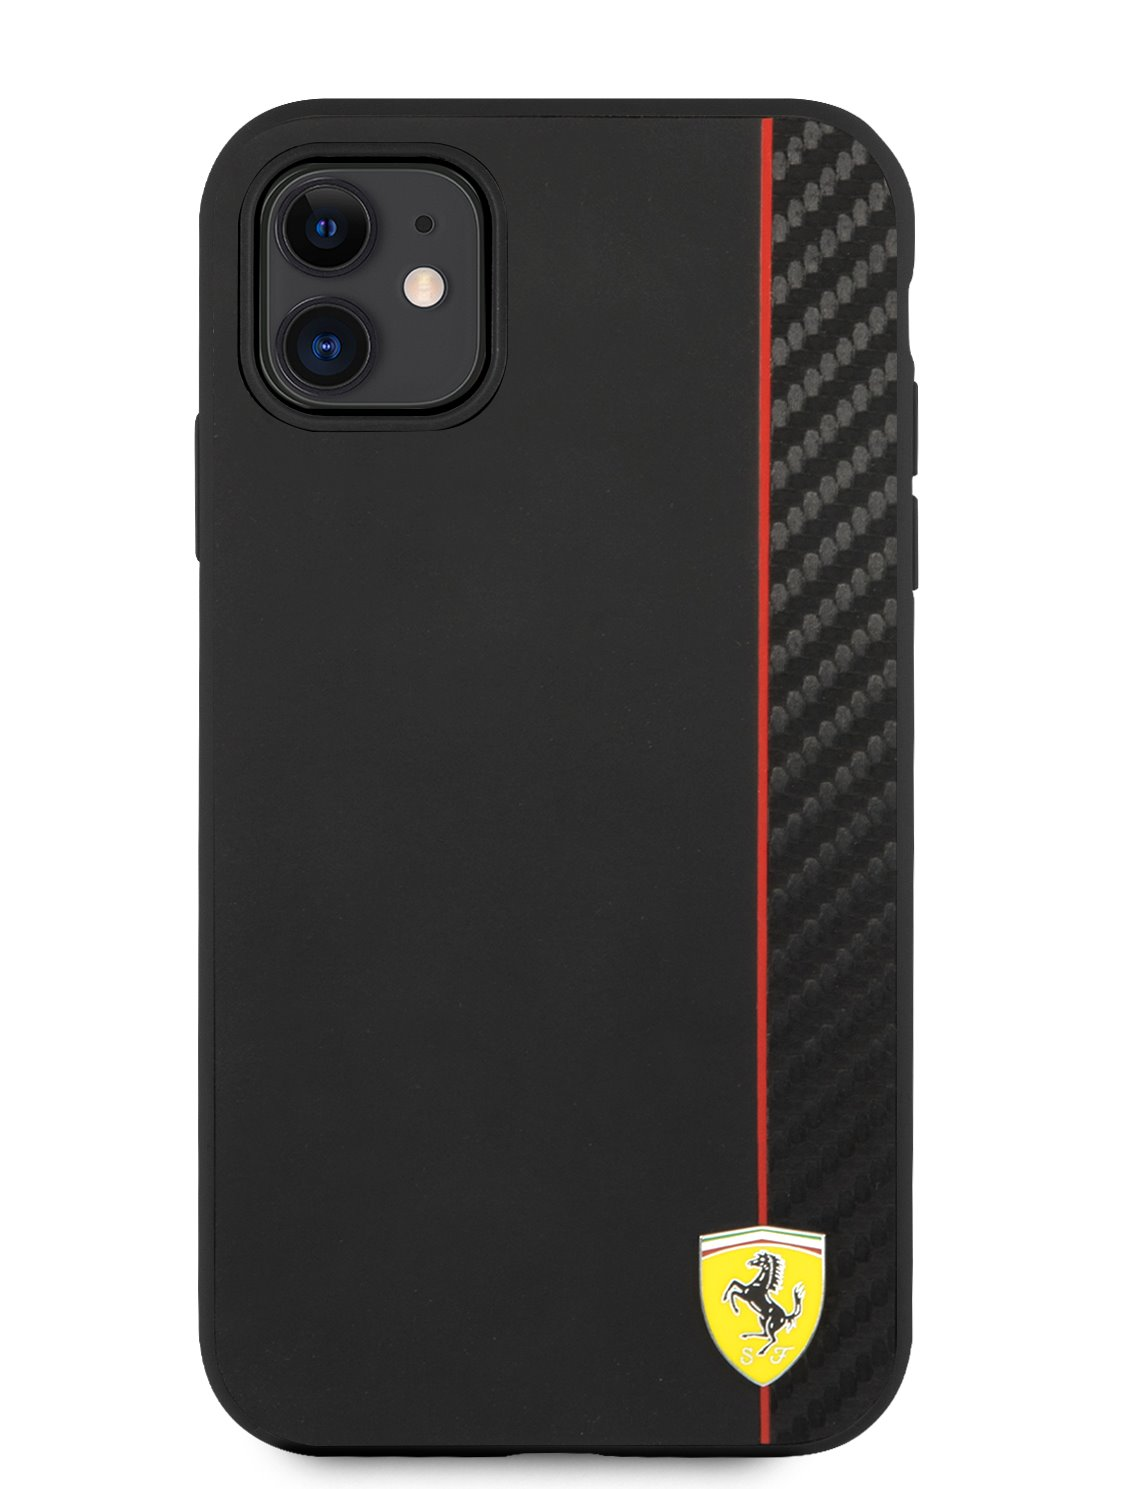 FESAXHCN61BK Ferrari On Track Stripe Carbon Zadní Kryt pro iPhone 11 Black 3666339015497